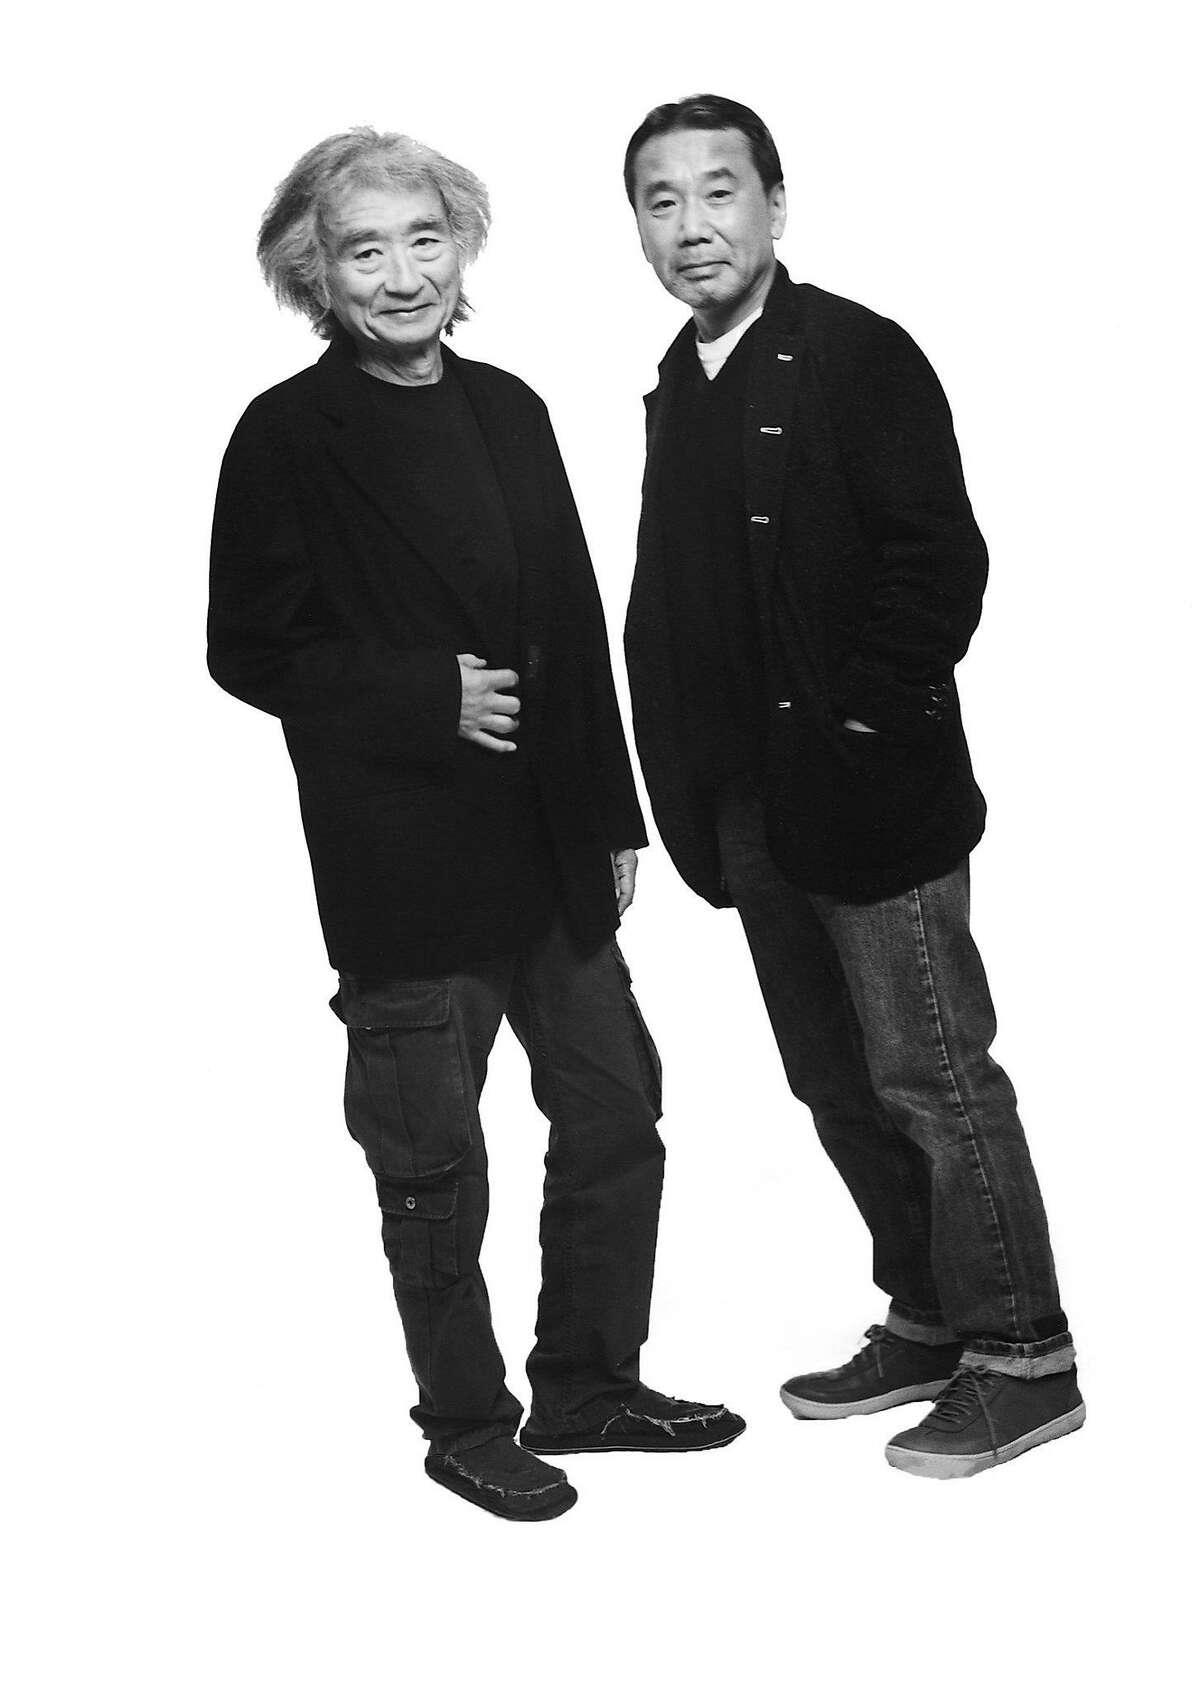 Seiji Ozawa and Haruki Murakami